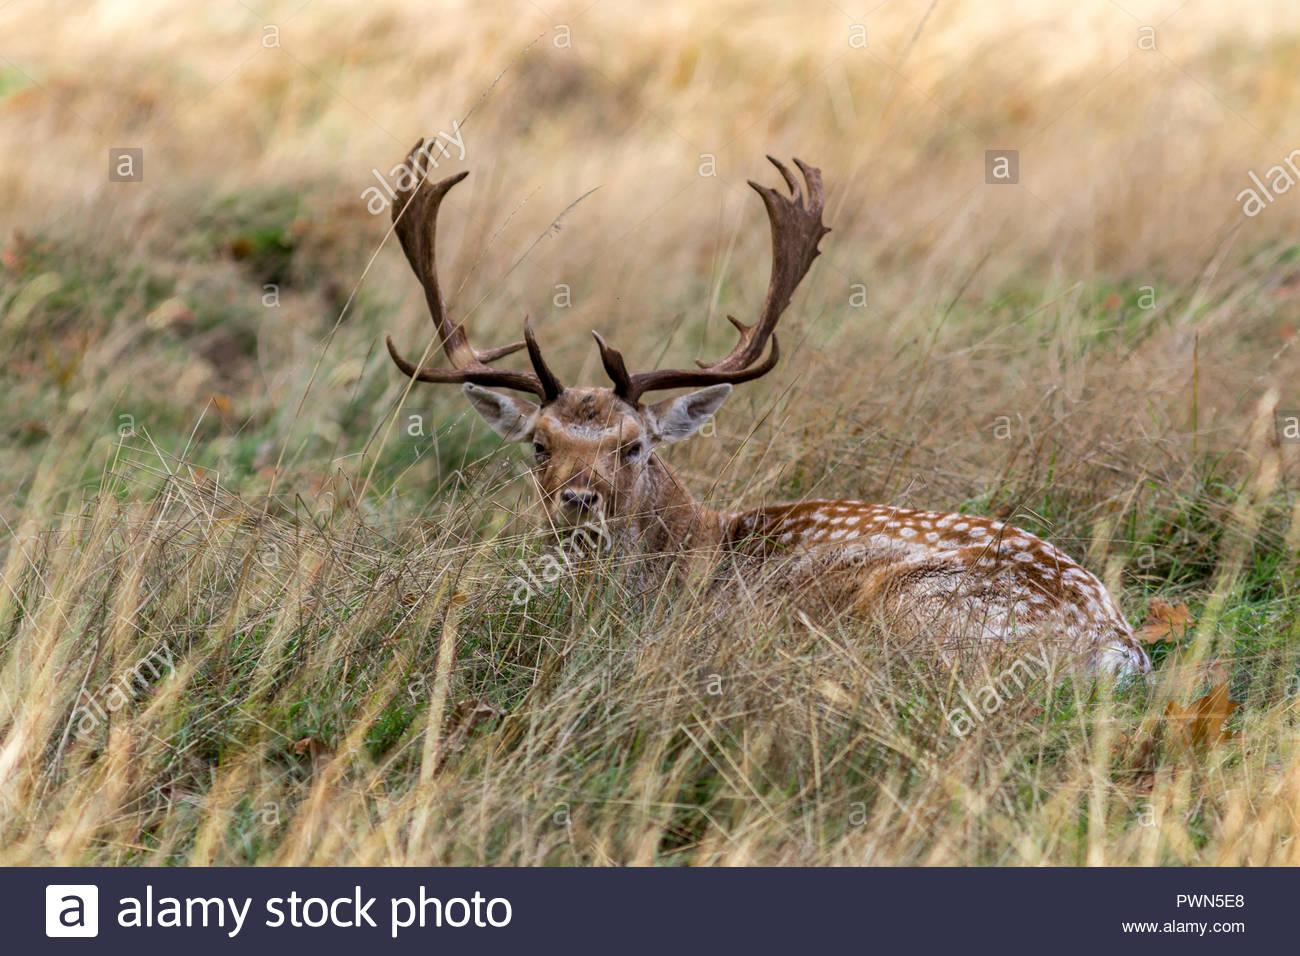 A fallow deer buck lying in long grass in the autumn sun. - Stock Image